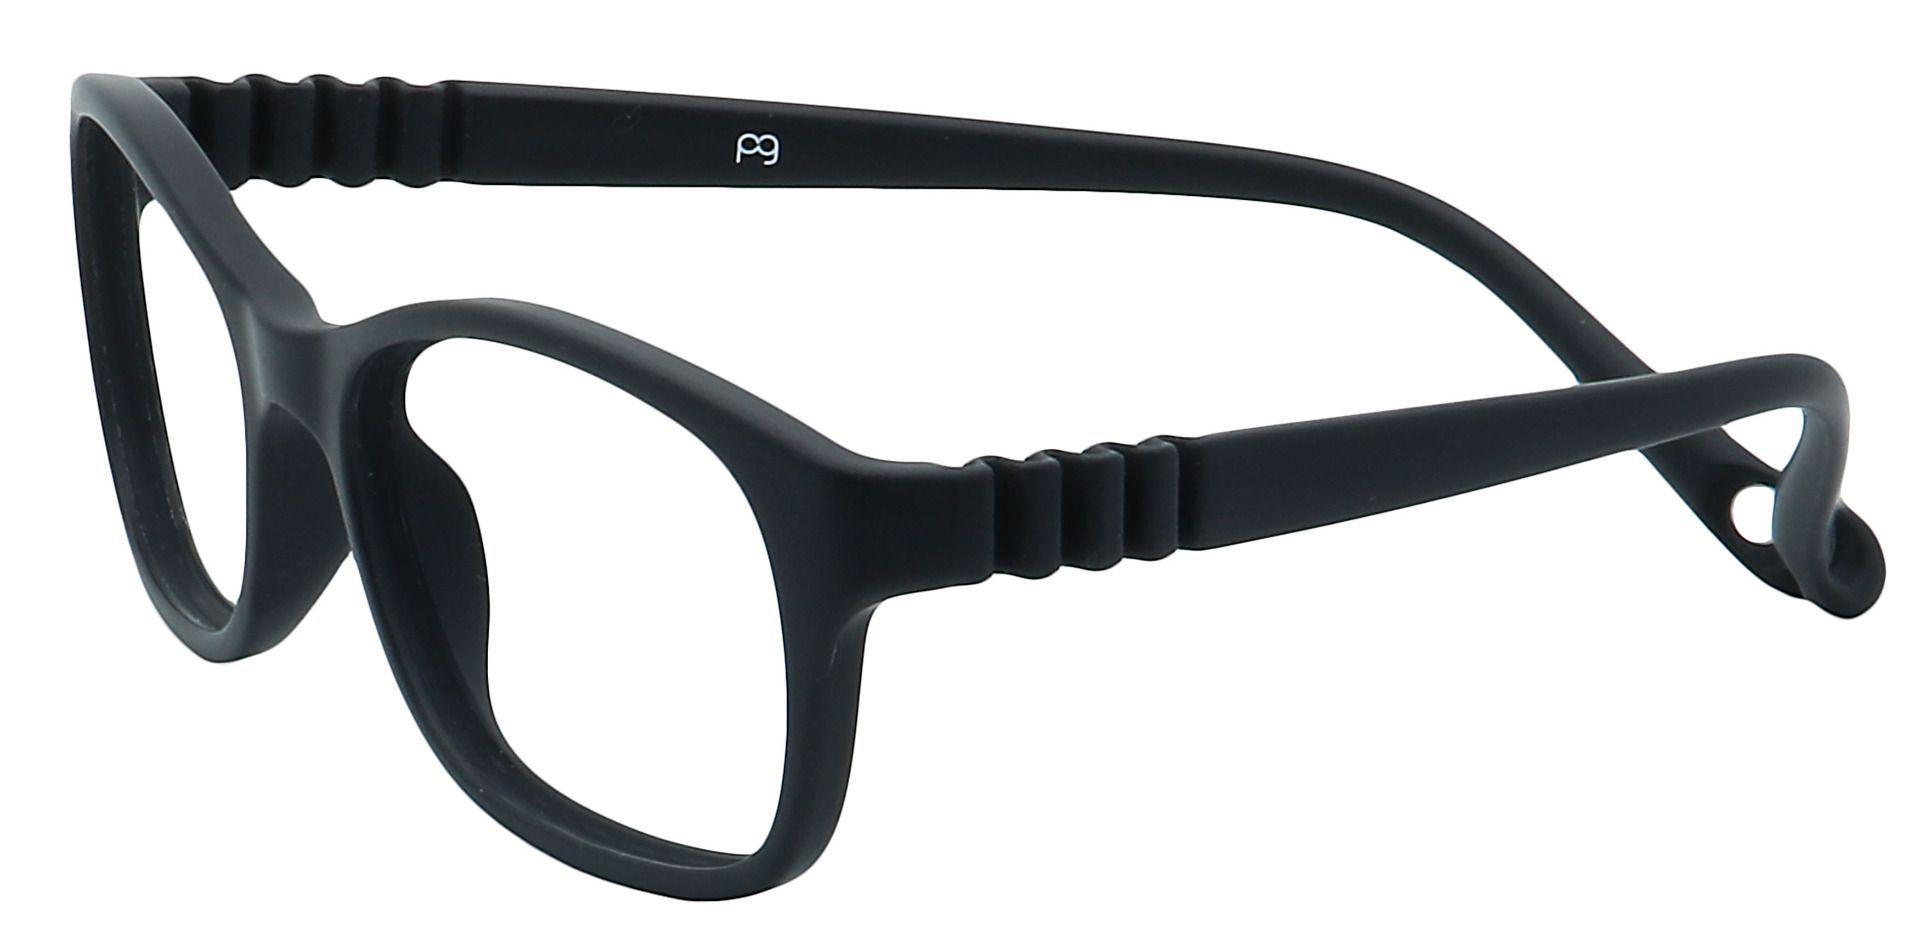 Sunny Oval Blue Light Blocking Glasses - Black